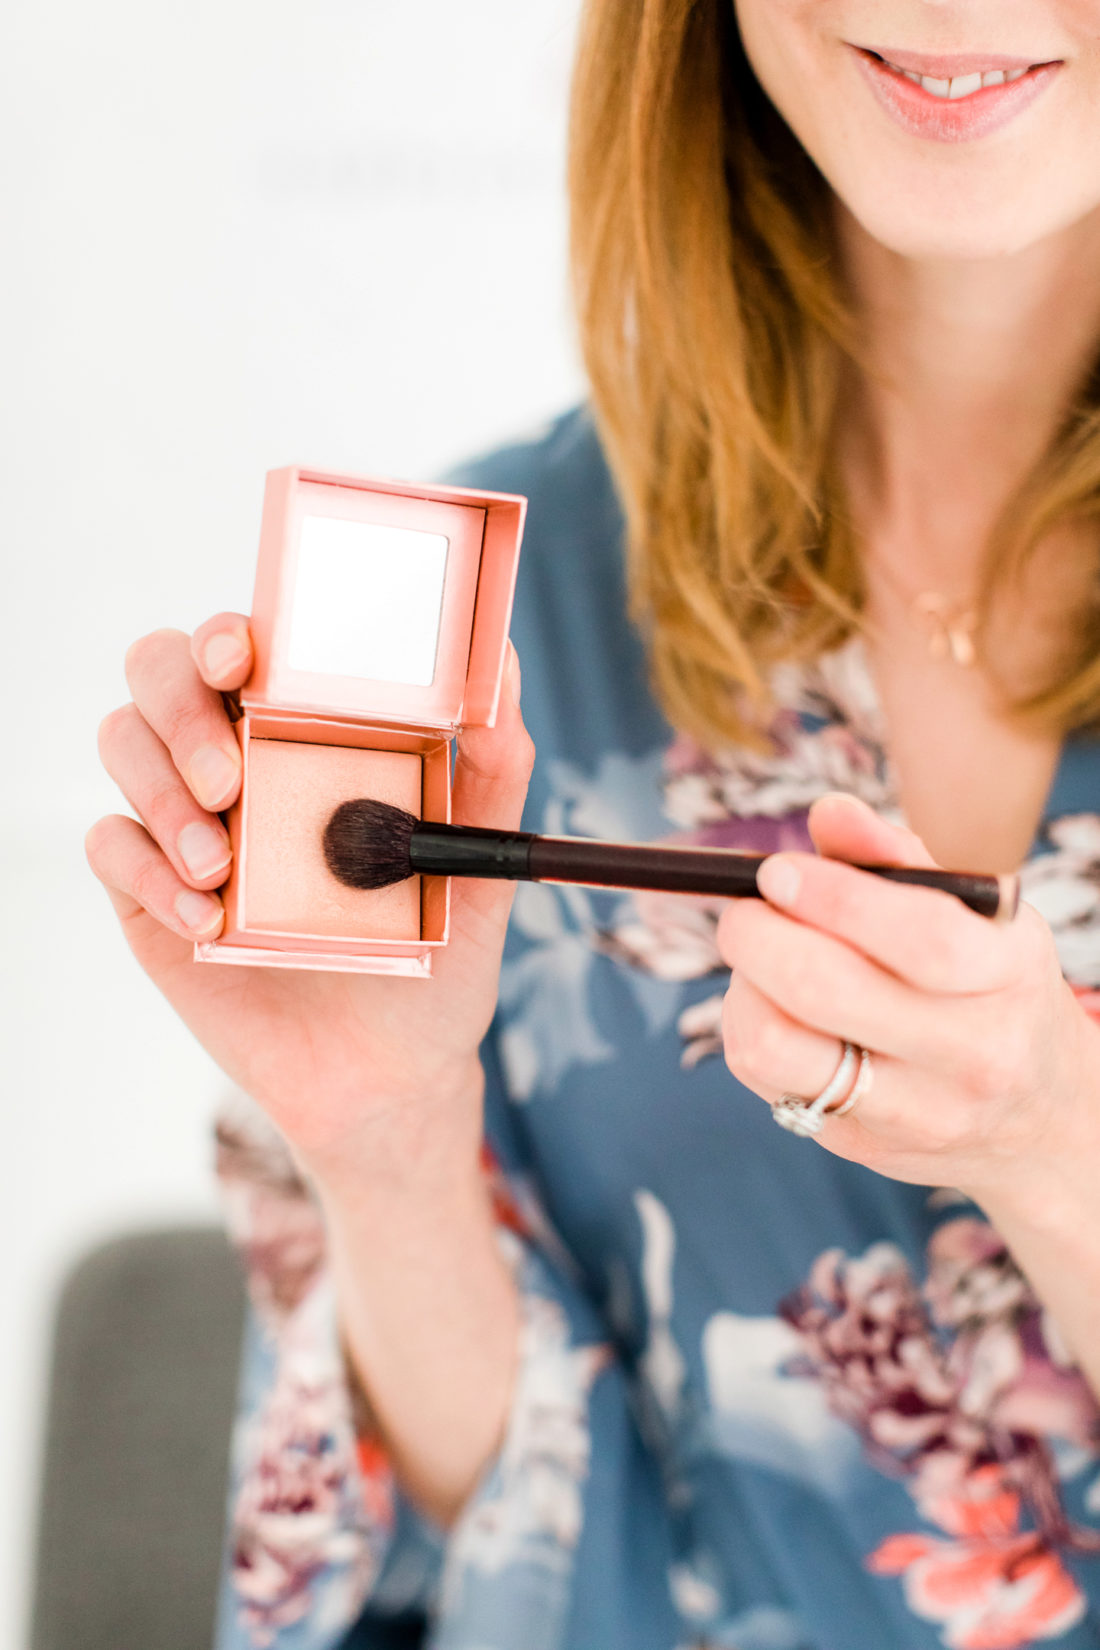 My photo shoot makeup look happily eva after eva amurri martino applies highlighter as part of her photo shoot makeup tutorial baditri Images